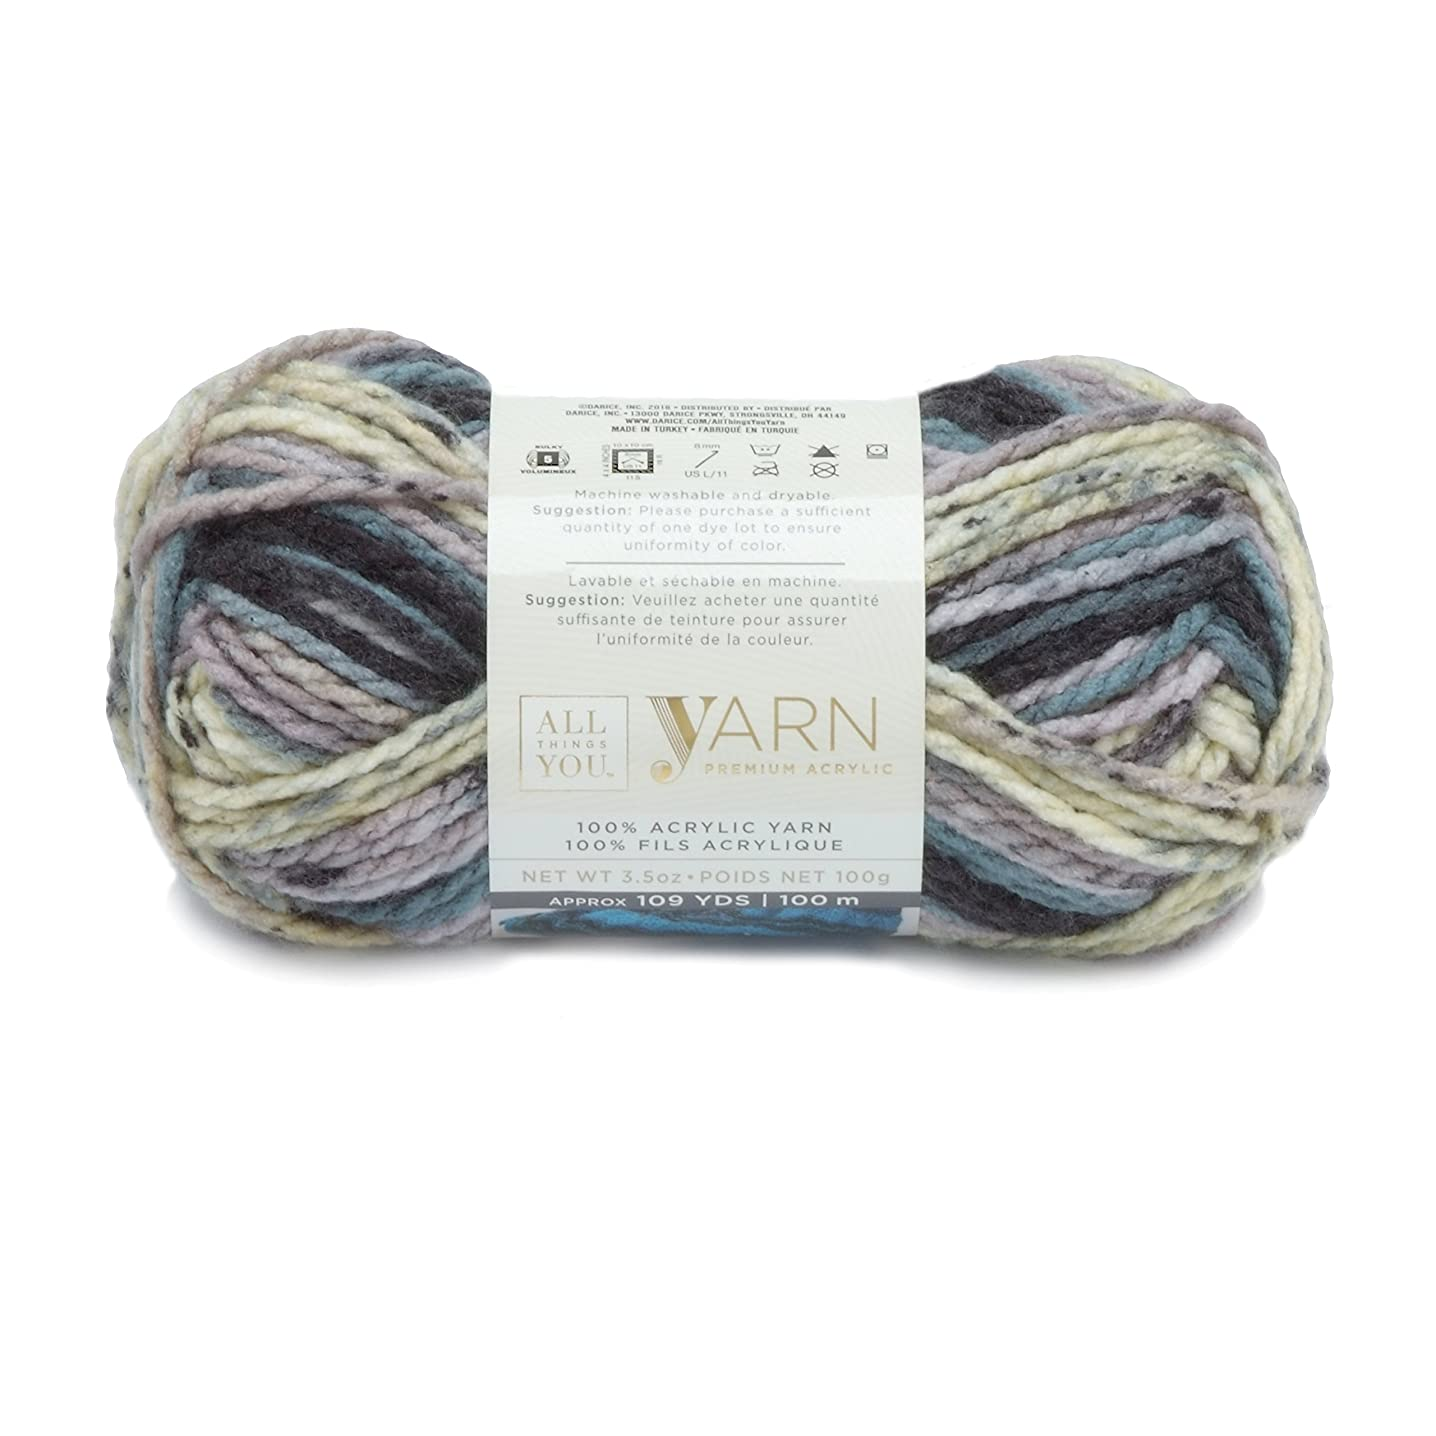 Darice All Things You, Premium Acylic Yarn, Stormy